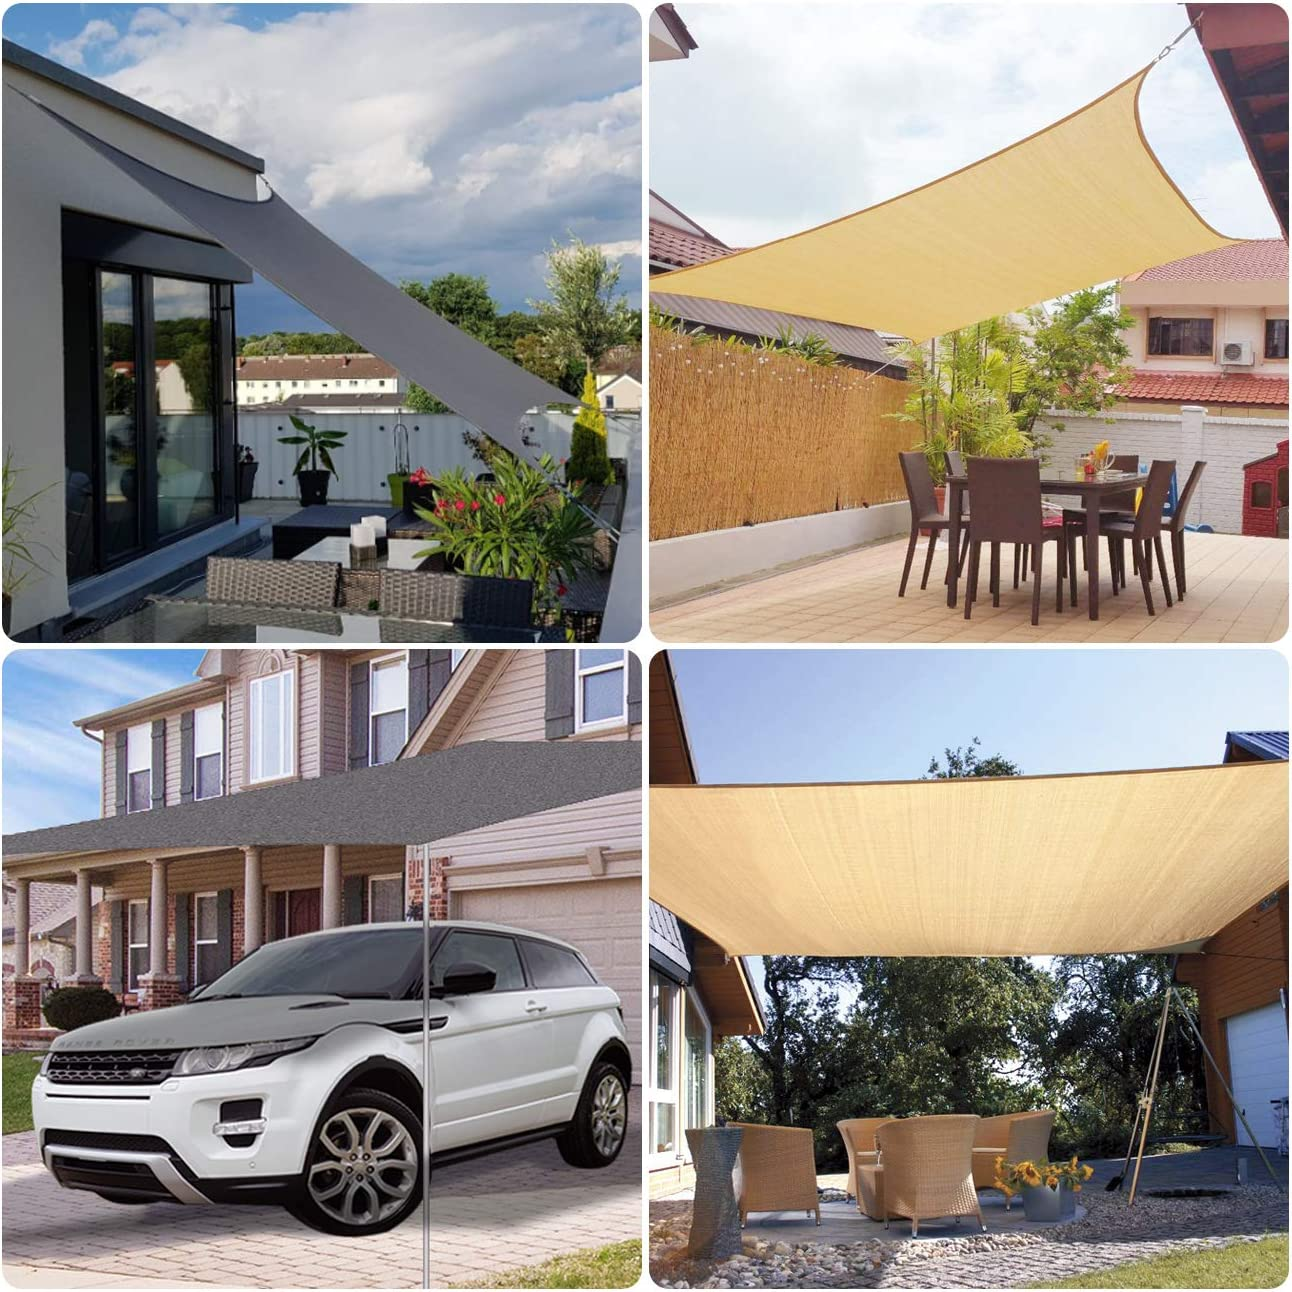 Sekey Toldo Vela de Sombra Rectangular HDPE Protección Rayos UV Resistente Permeable Transpirable para Patio, Exteriores, Jardín, 3× 4m Arena, con Cuerda Libre: Amazon.es: Jardín